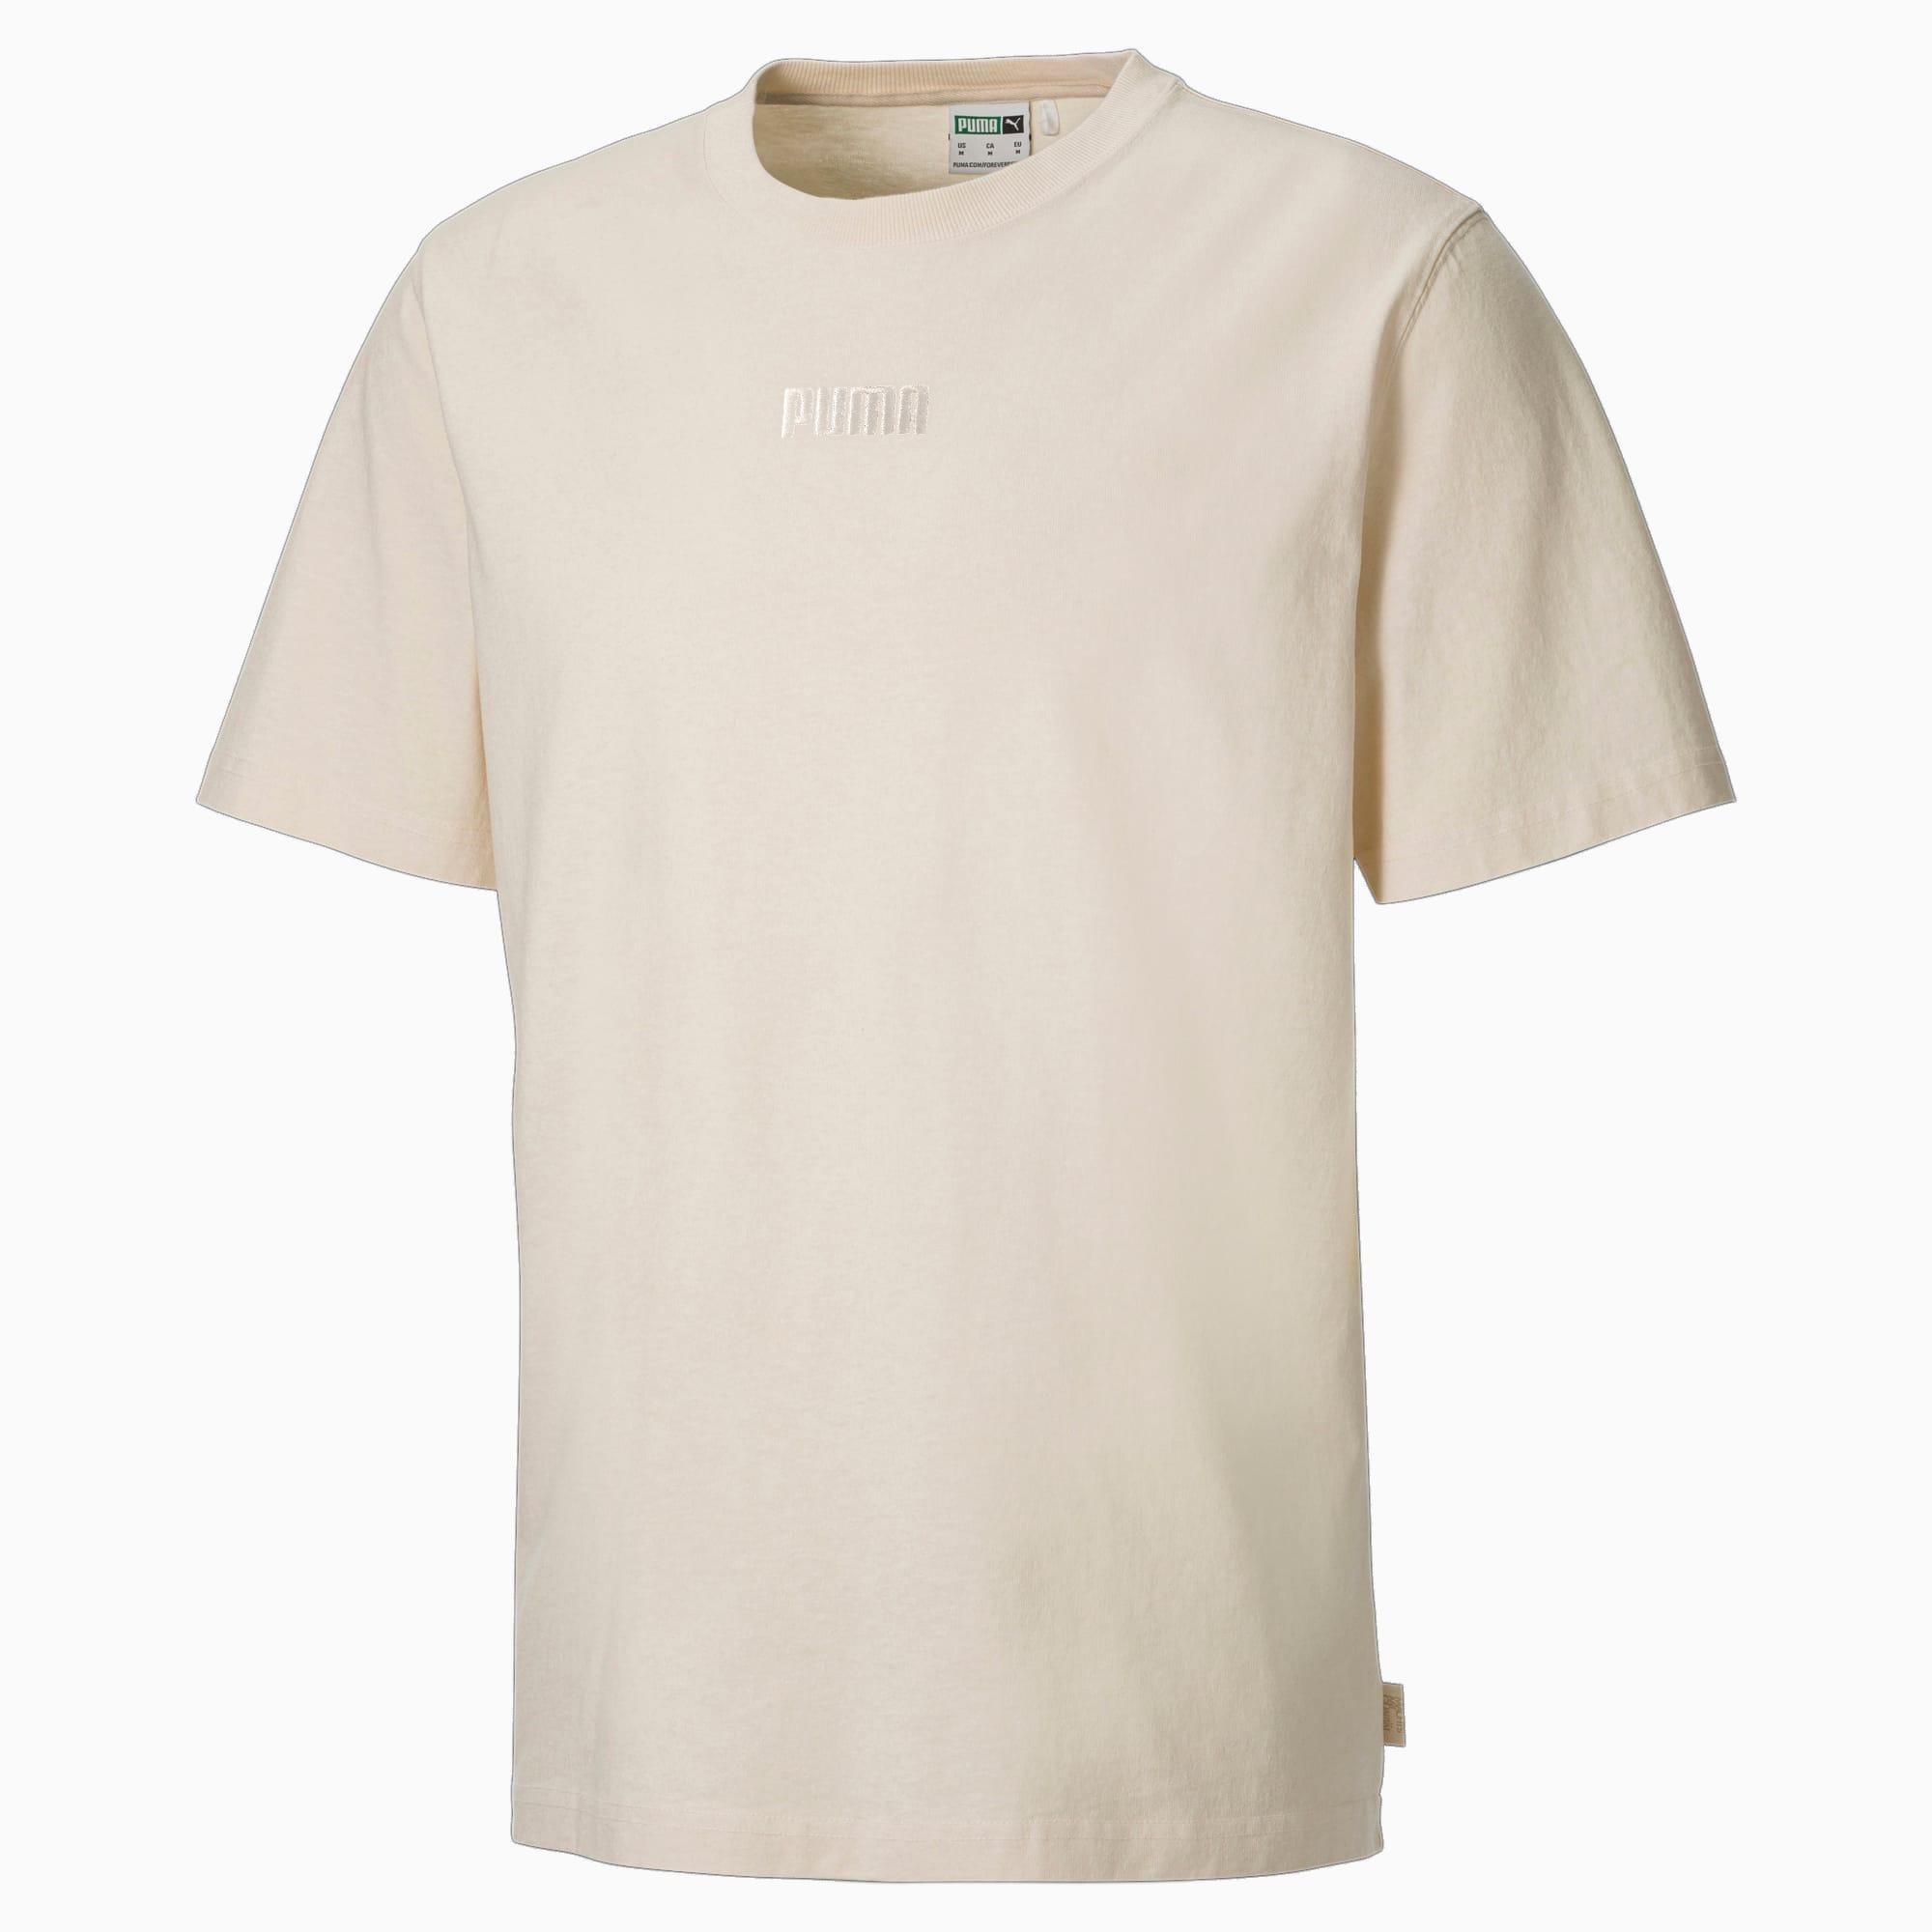 MMQ EARTHBREAK T-shirt heren, Wit, Maat XS | PUMA